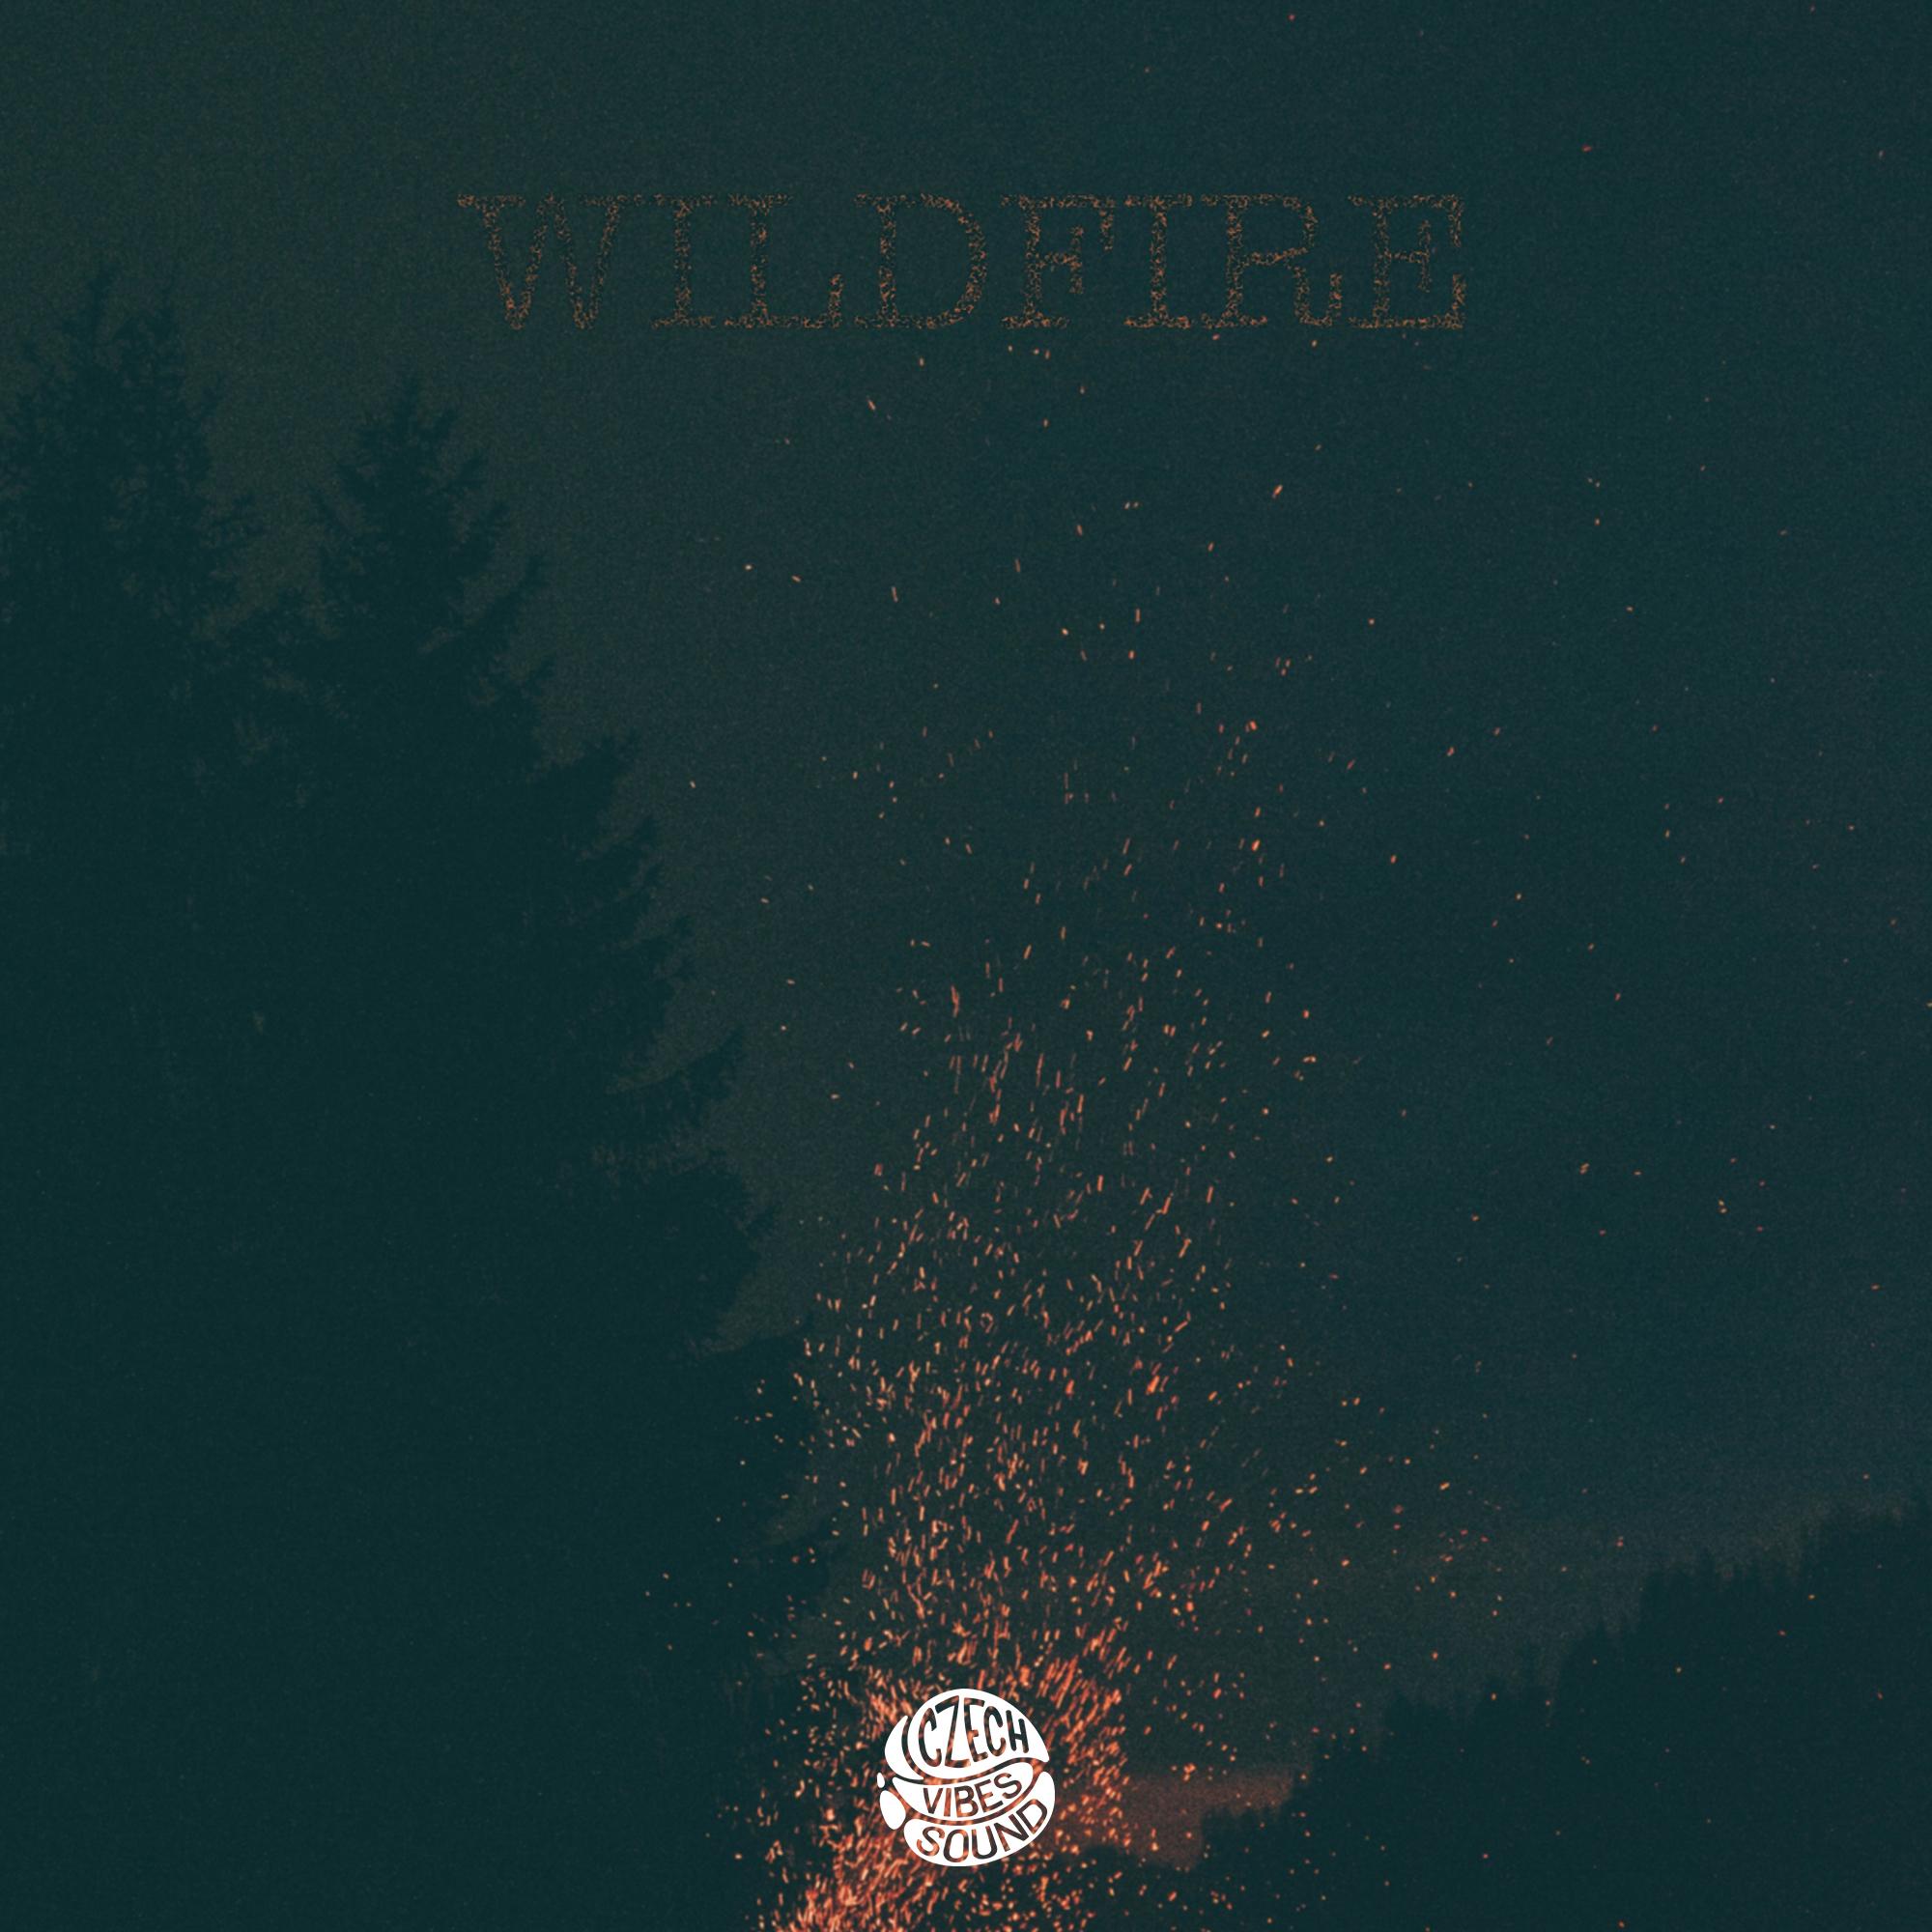 Devon Rea x Yummm - Wildfire